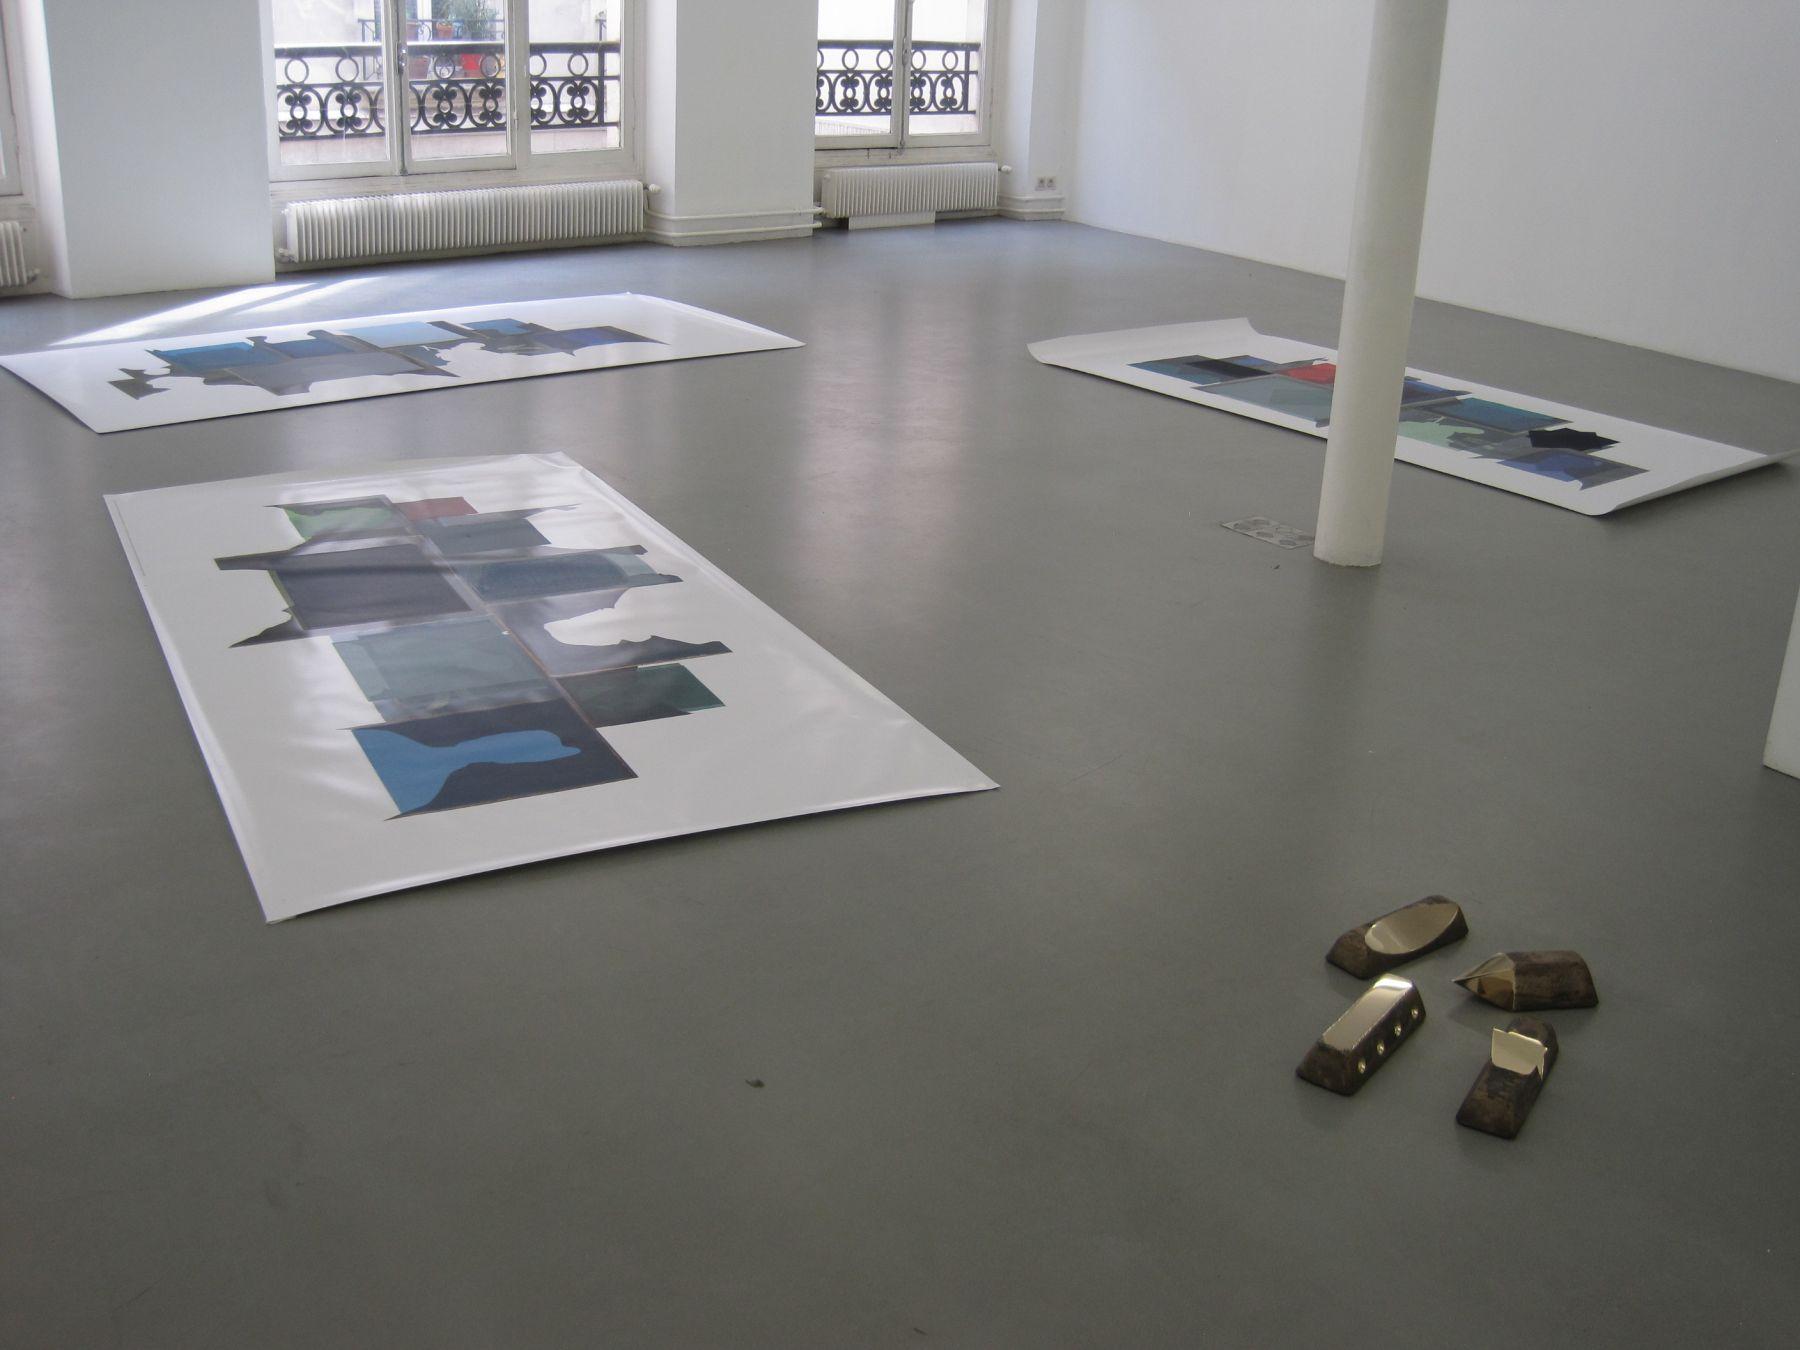 Blanks and Ballast, Galerie Nelson-Freeman, Paris, France.